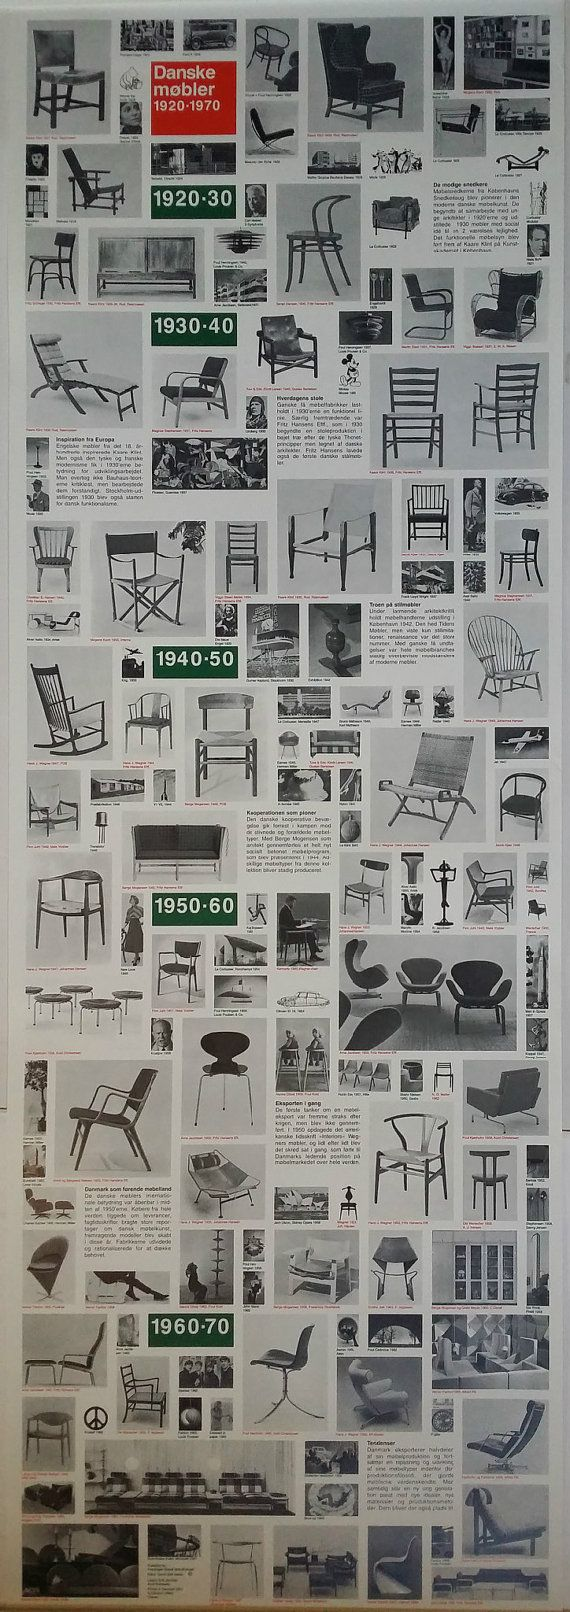 1970s Danish Designer Furnitures 1920-1970 - Original Vintage Posters